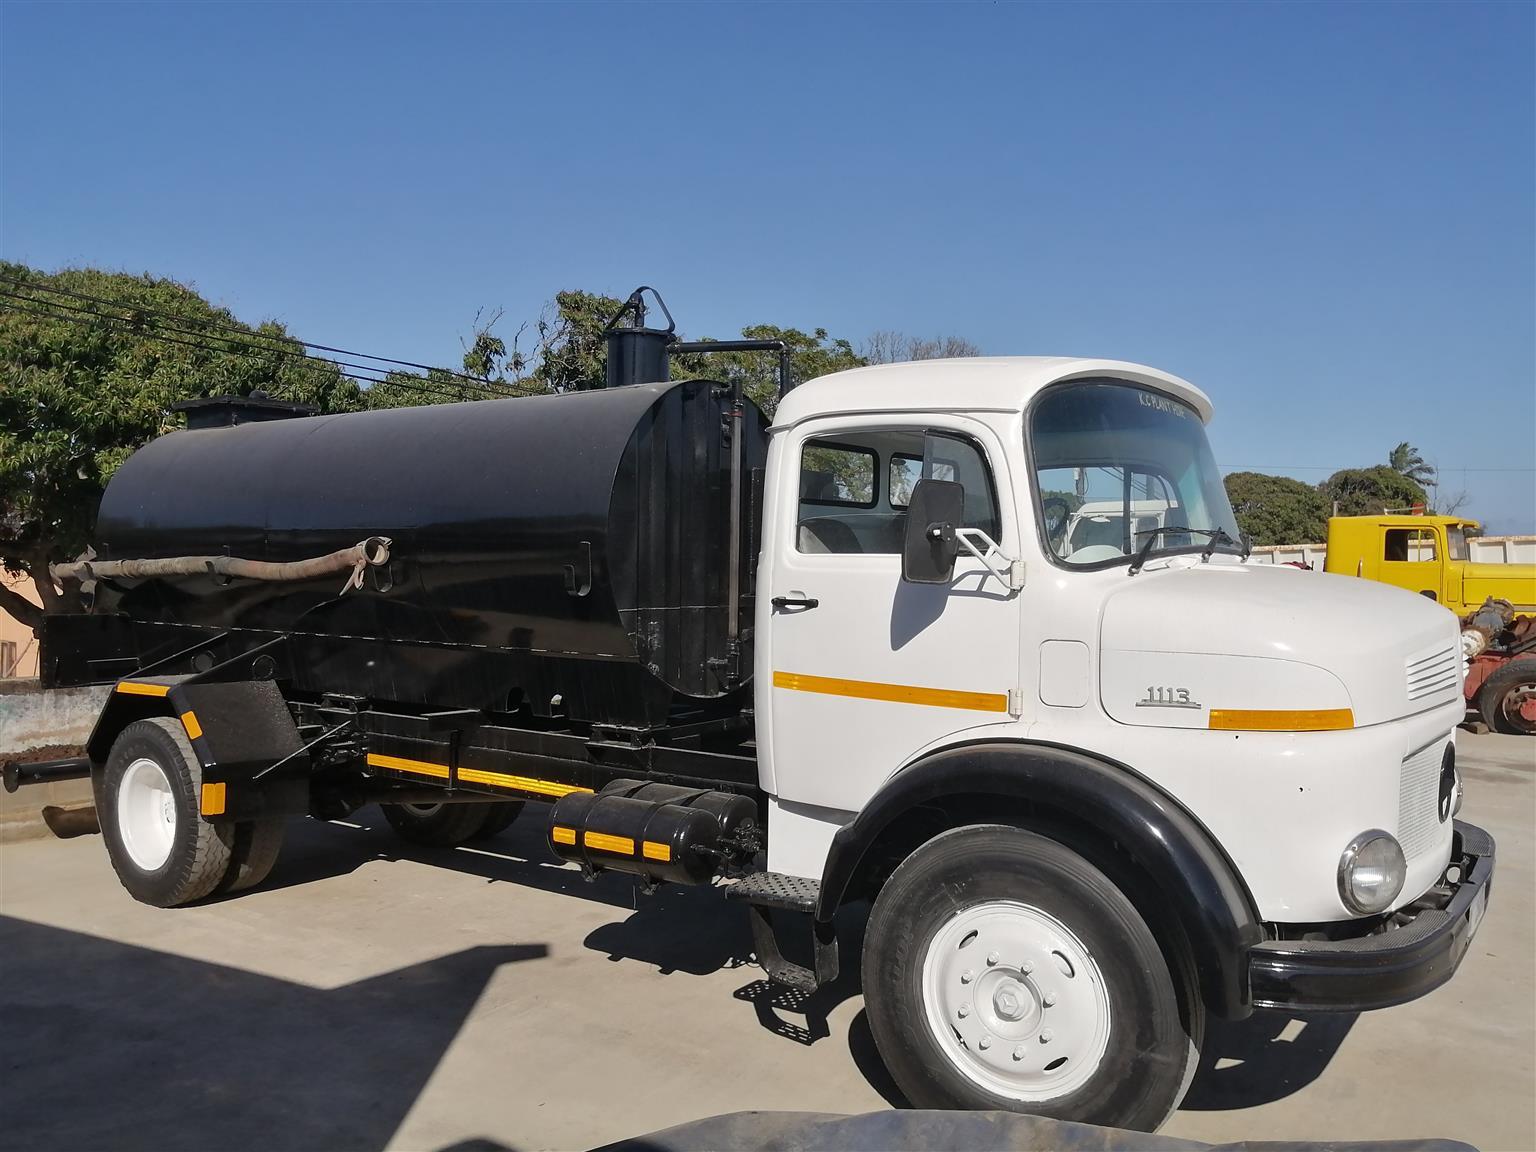 Mercedez Benz 1113 Sludge/ Water Tanker For Sale